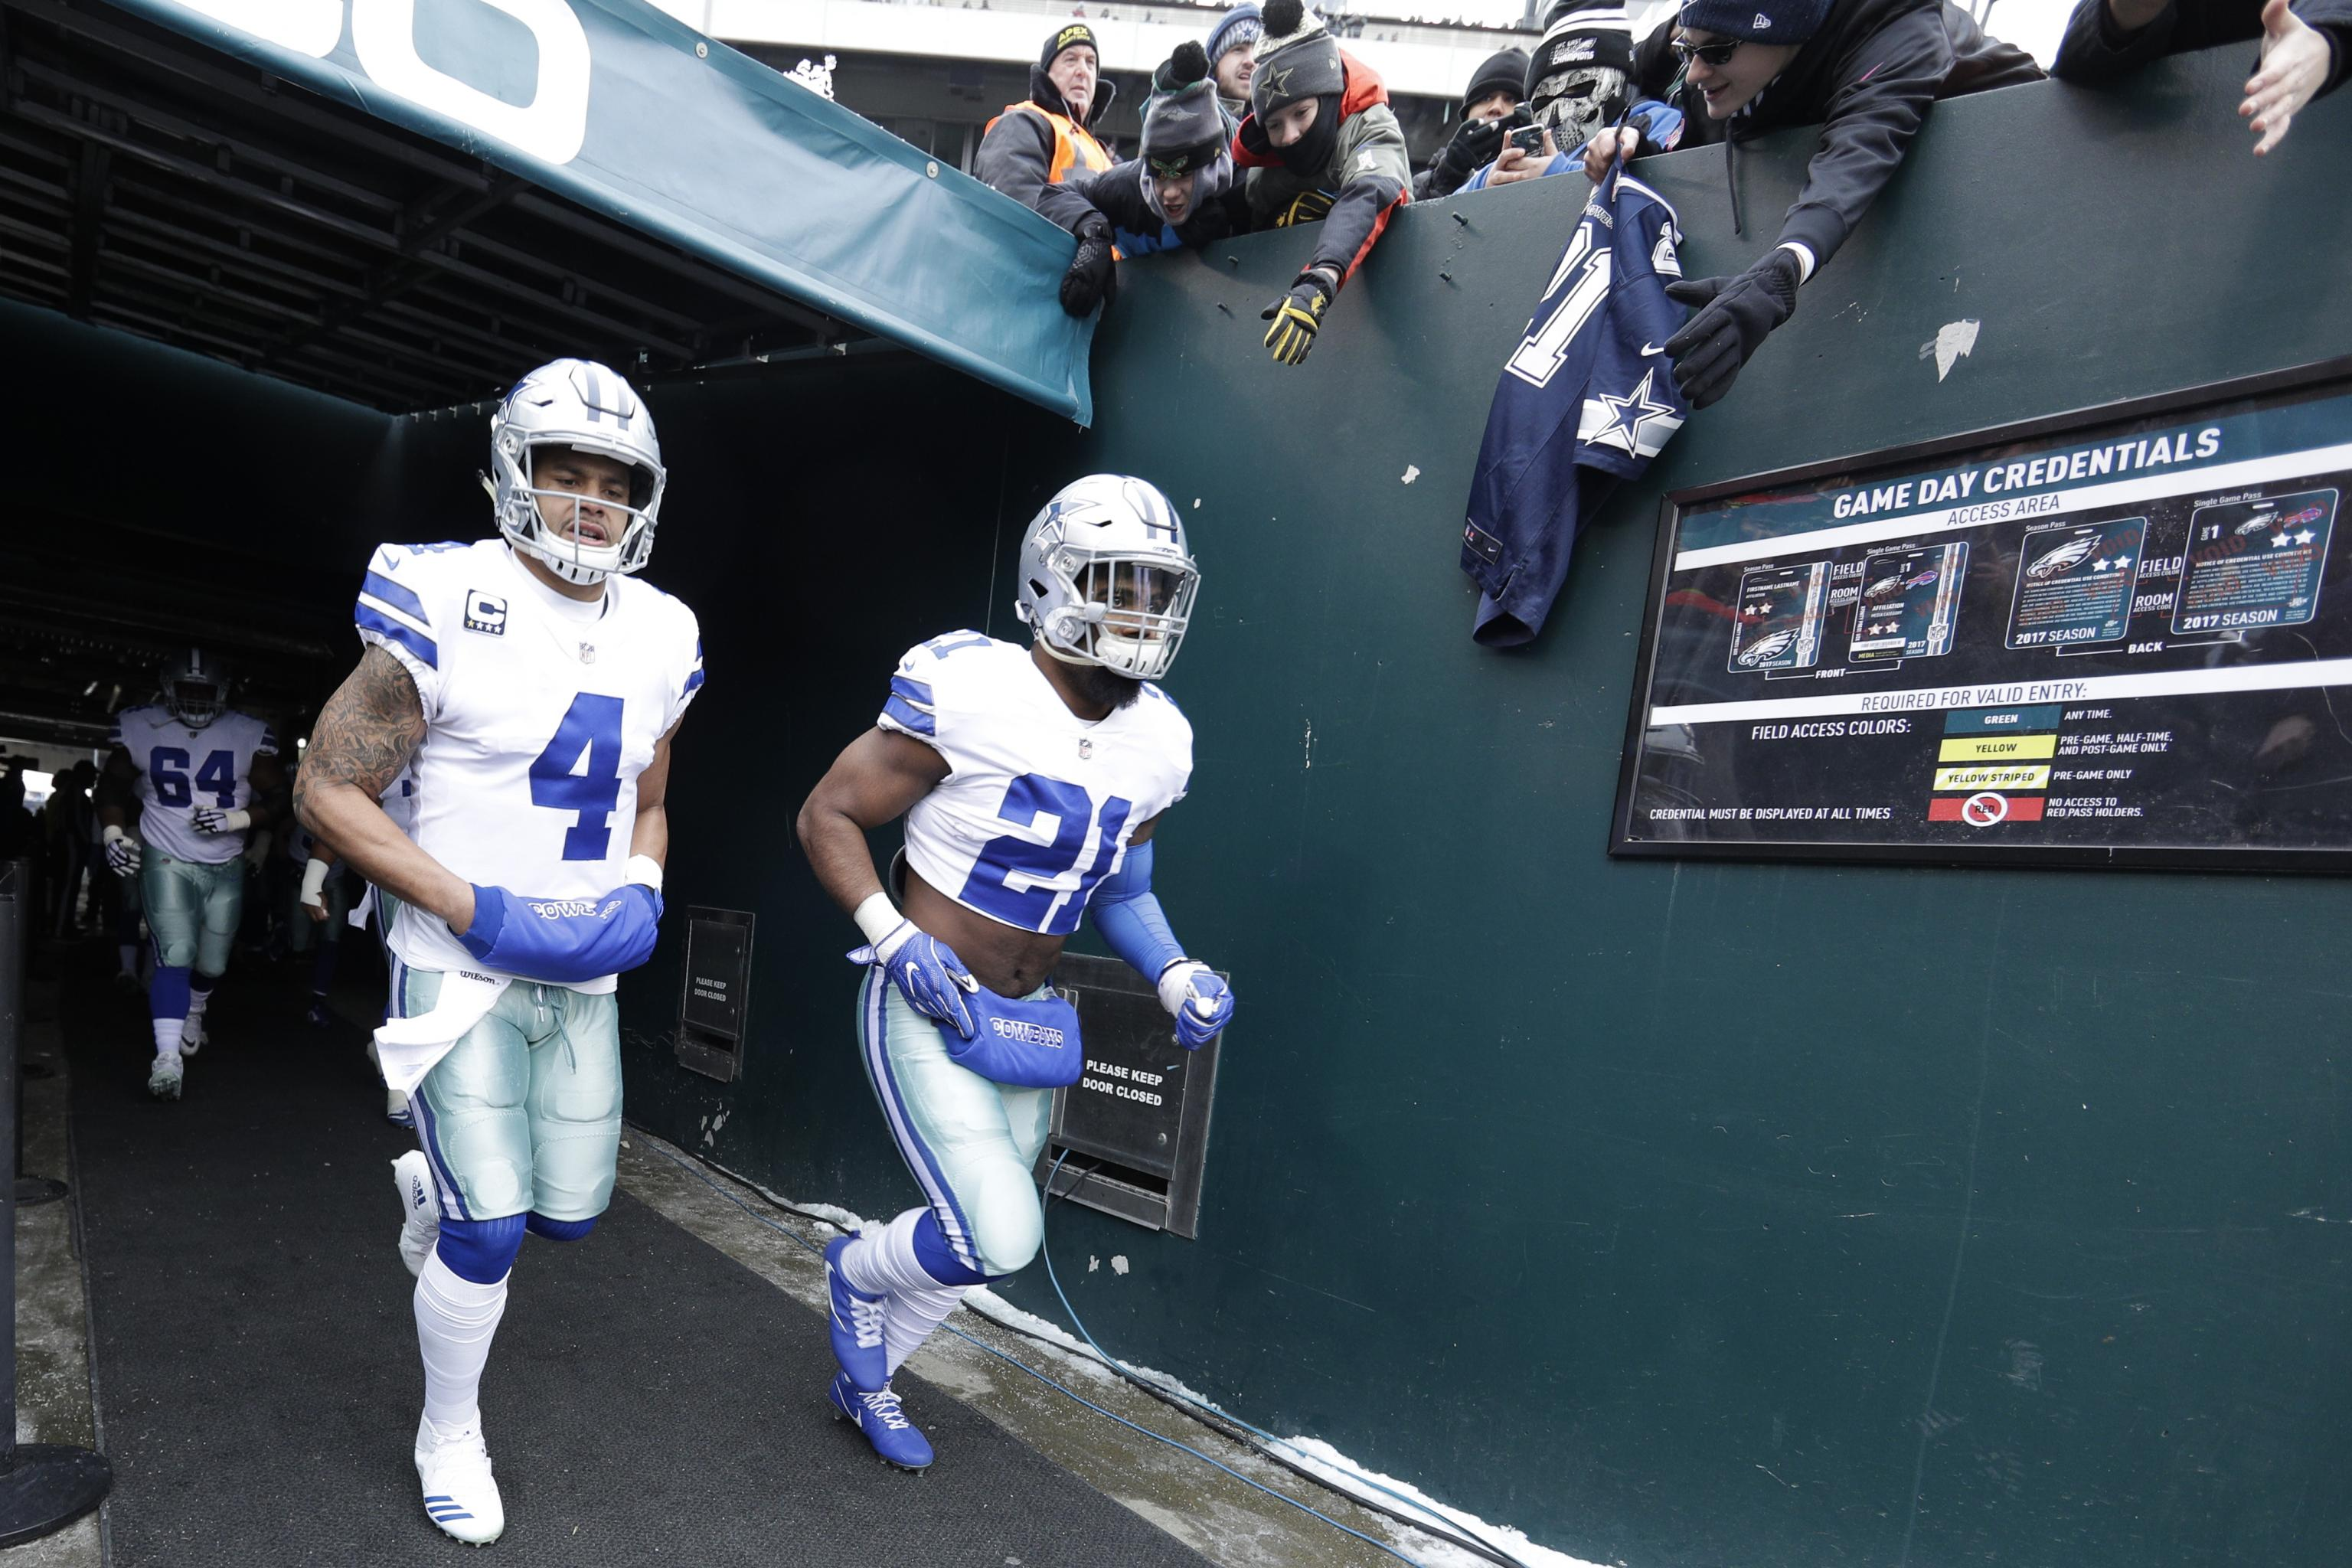 c2defad6 Dak Prescott, Ezekiel Elliott, Tom Brady Lead NFLPA's Merchandise ...